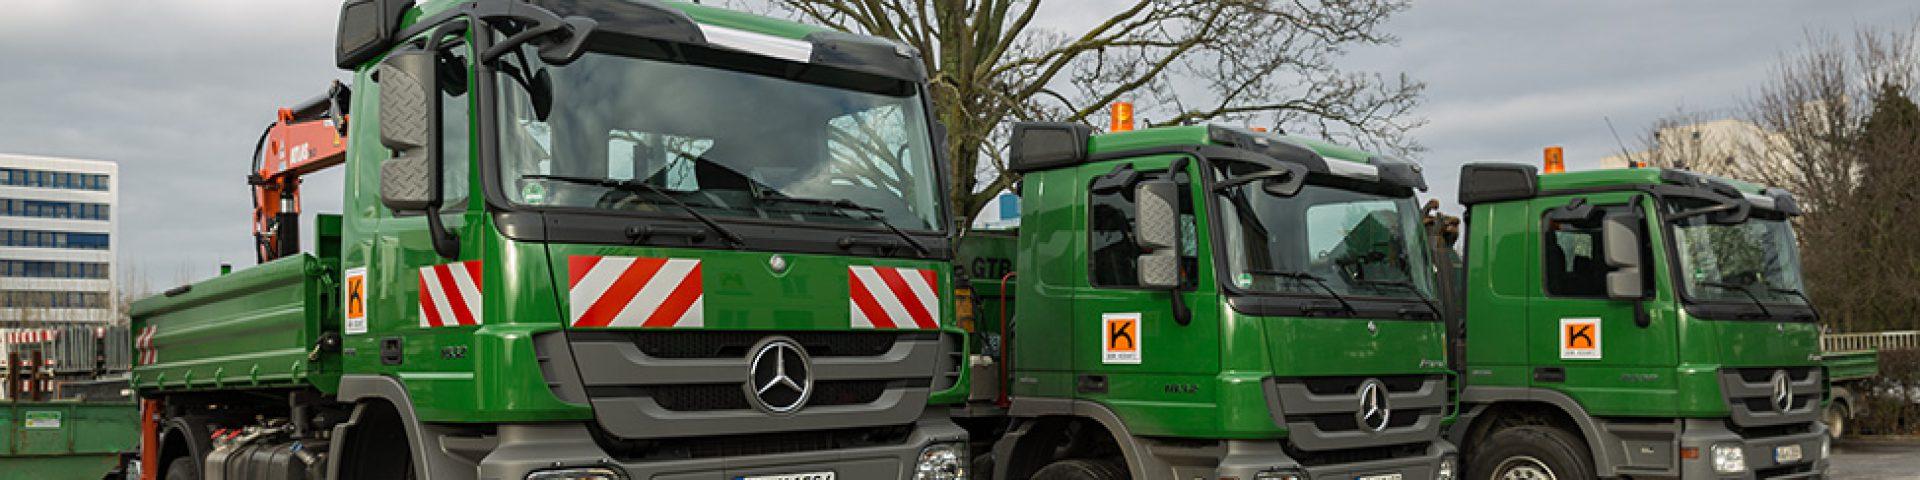 Gebr. Kickartz GmbH